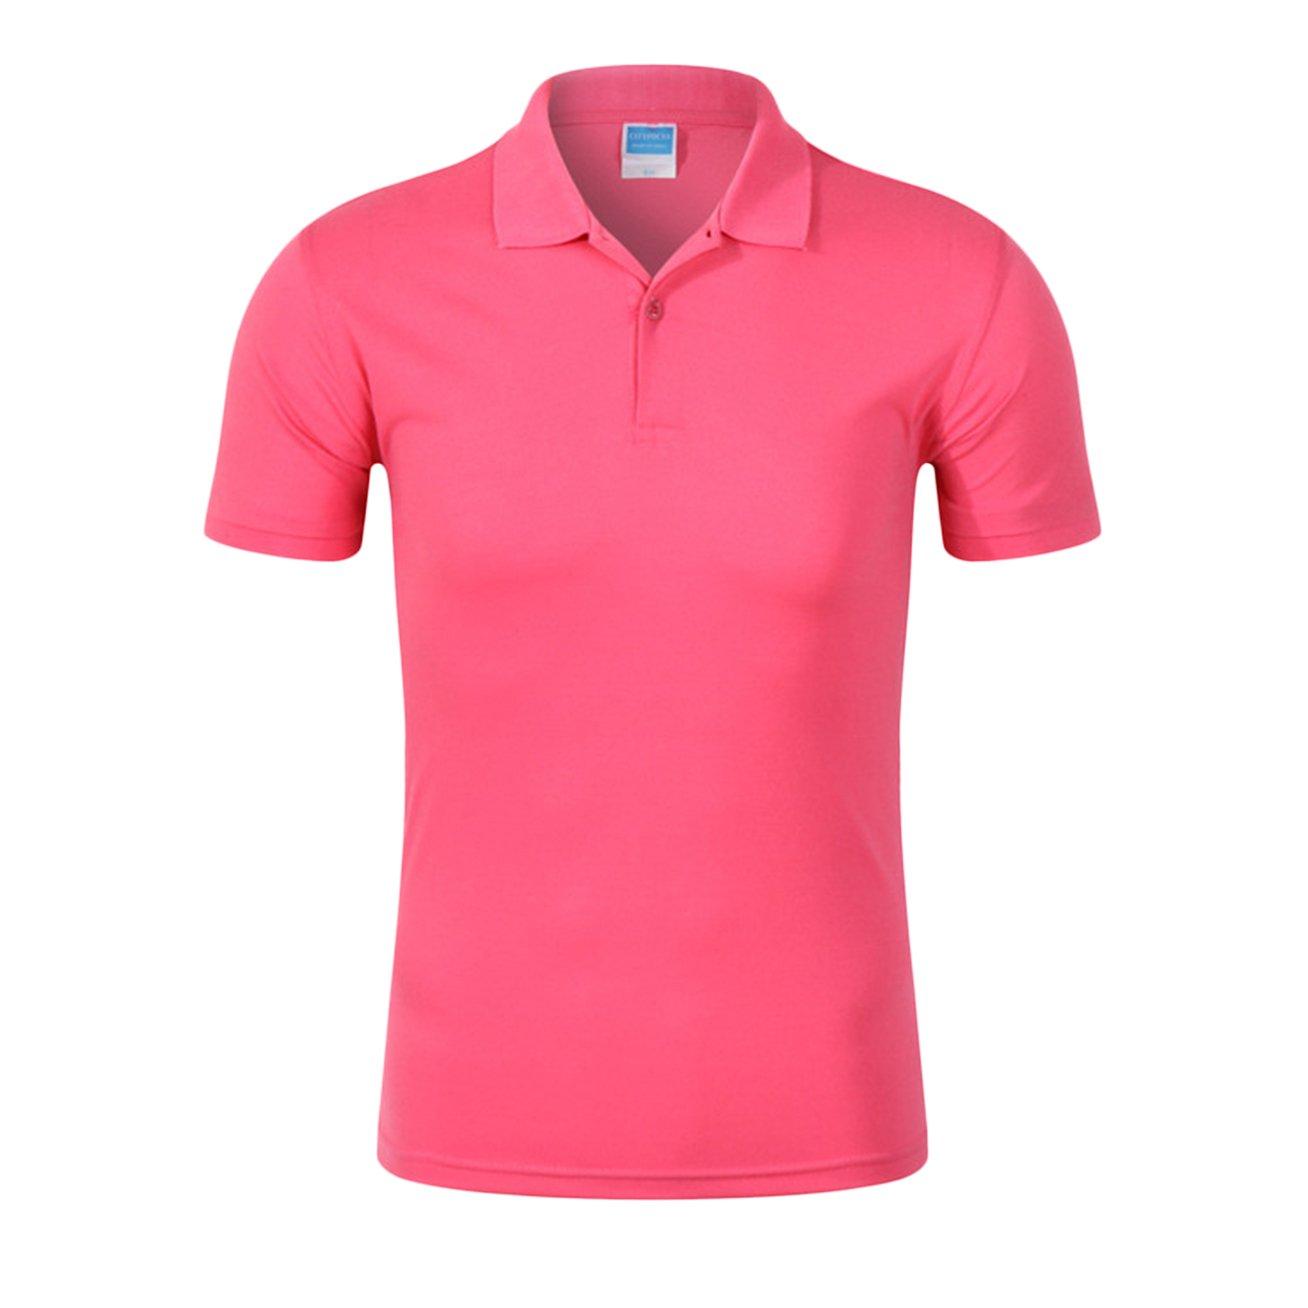 040d3cfb Averywin Womens Polo Shirts 2 Pack Tops T Shirt Plain Sportswear Short  Sleeve T-Shirts at Amazon Women's Clothing store: